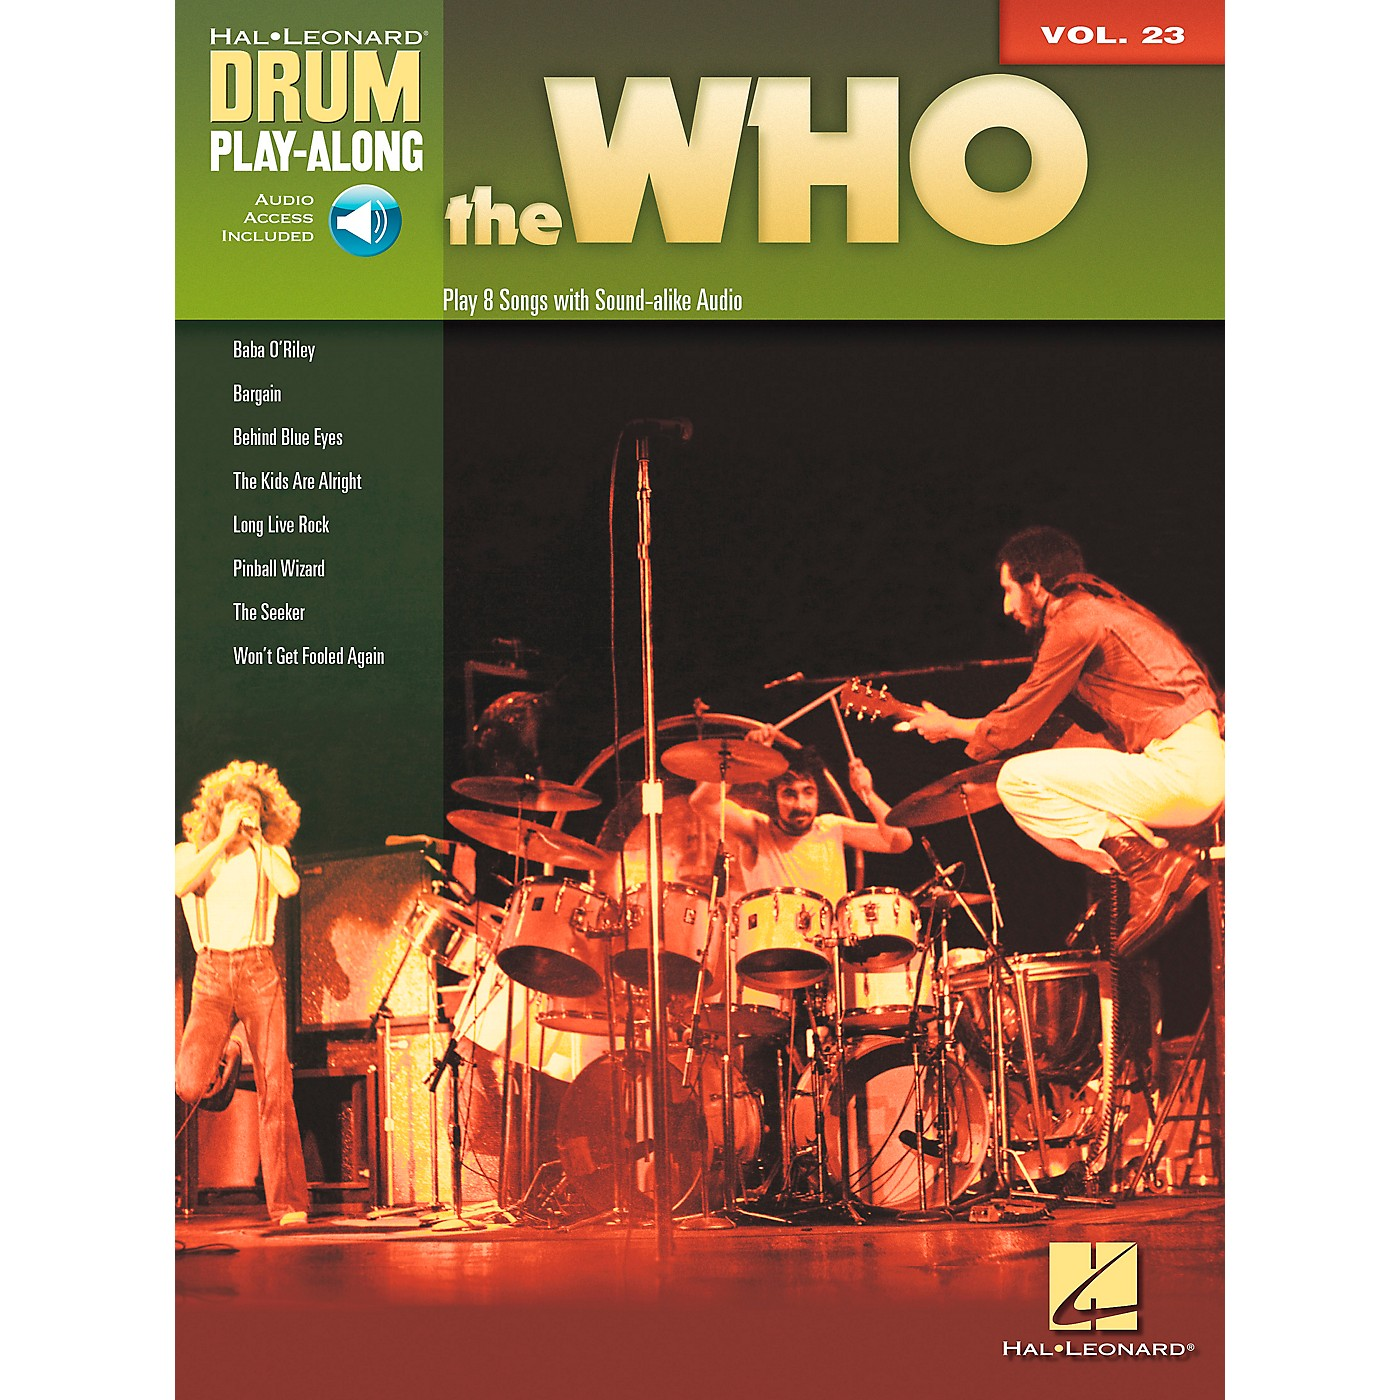 Hal Leonard The Who Drum Play-Along Volume 23 Book/CD thumbnail